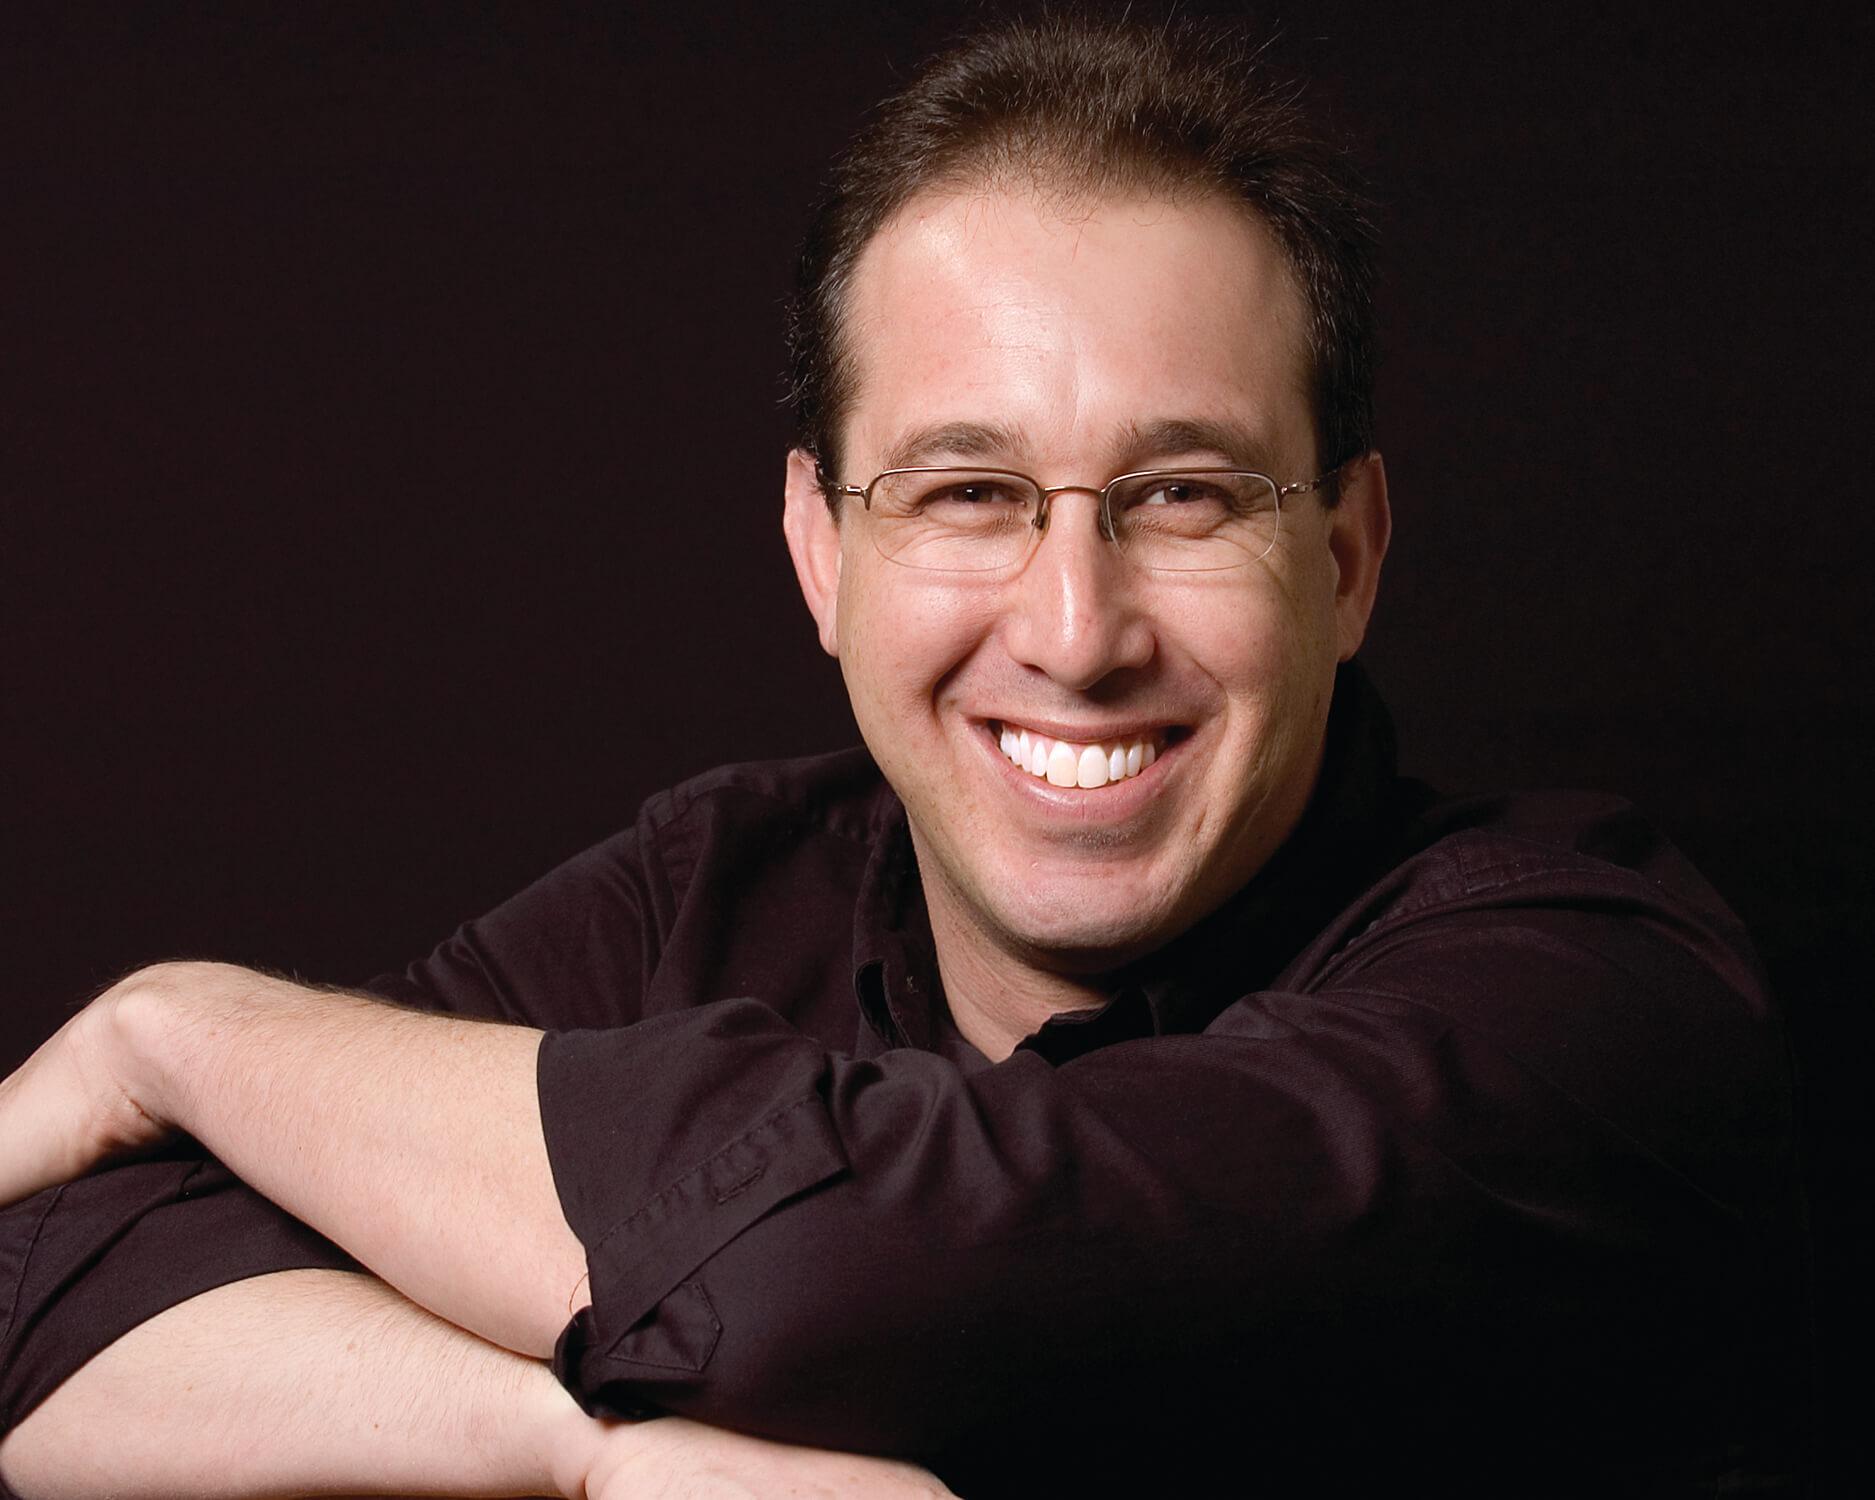 Michael-Gershe